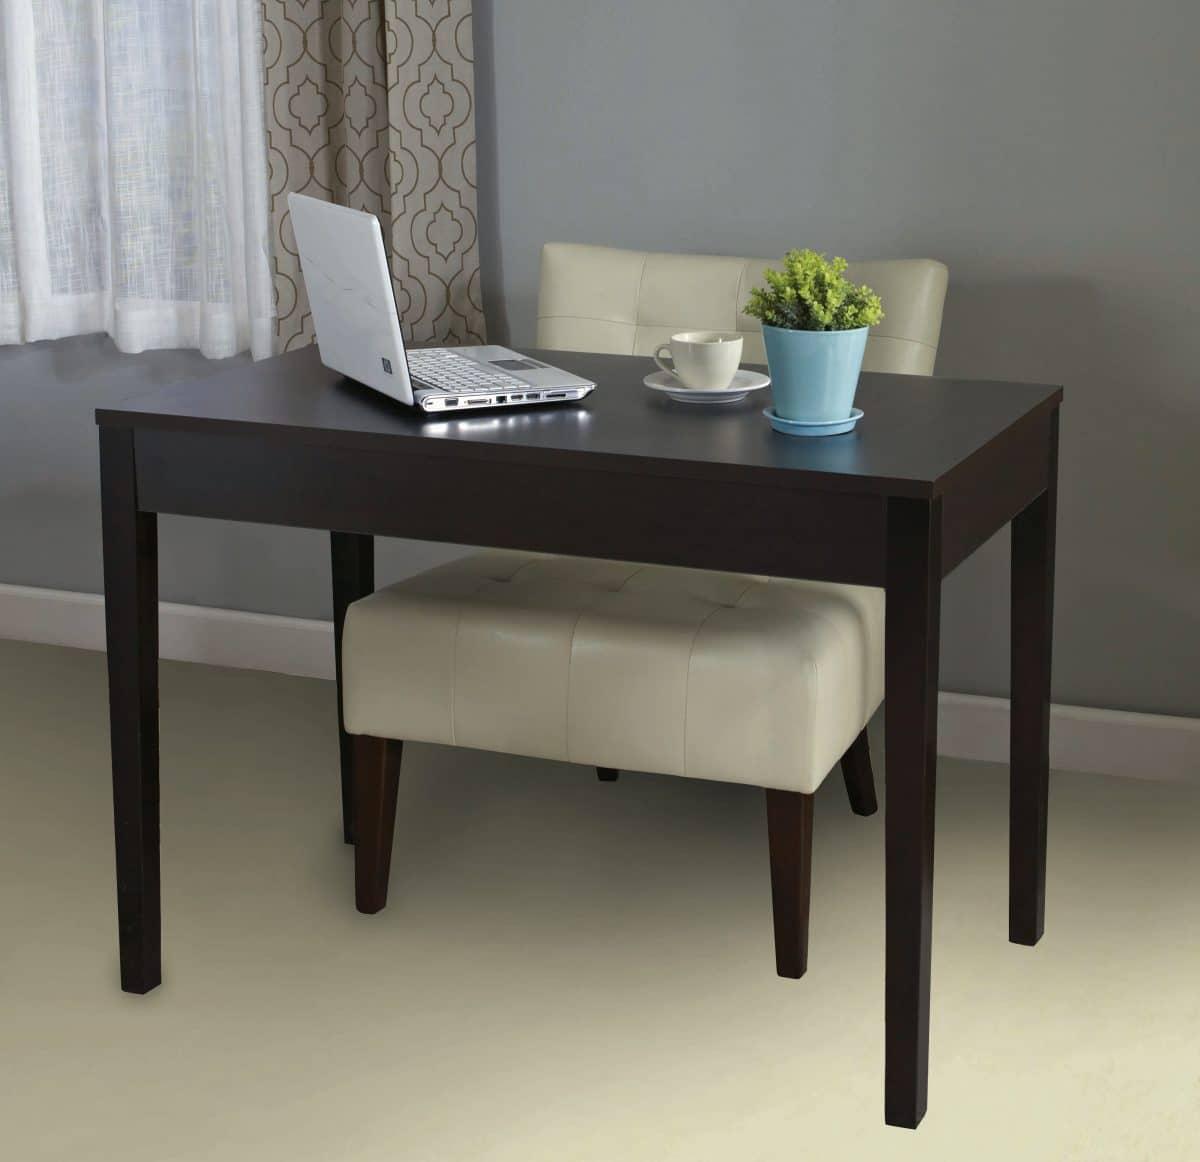 NODA Work Table